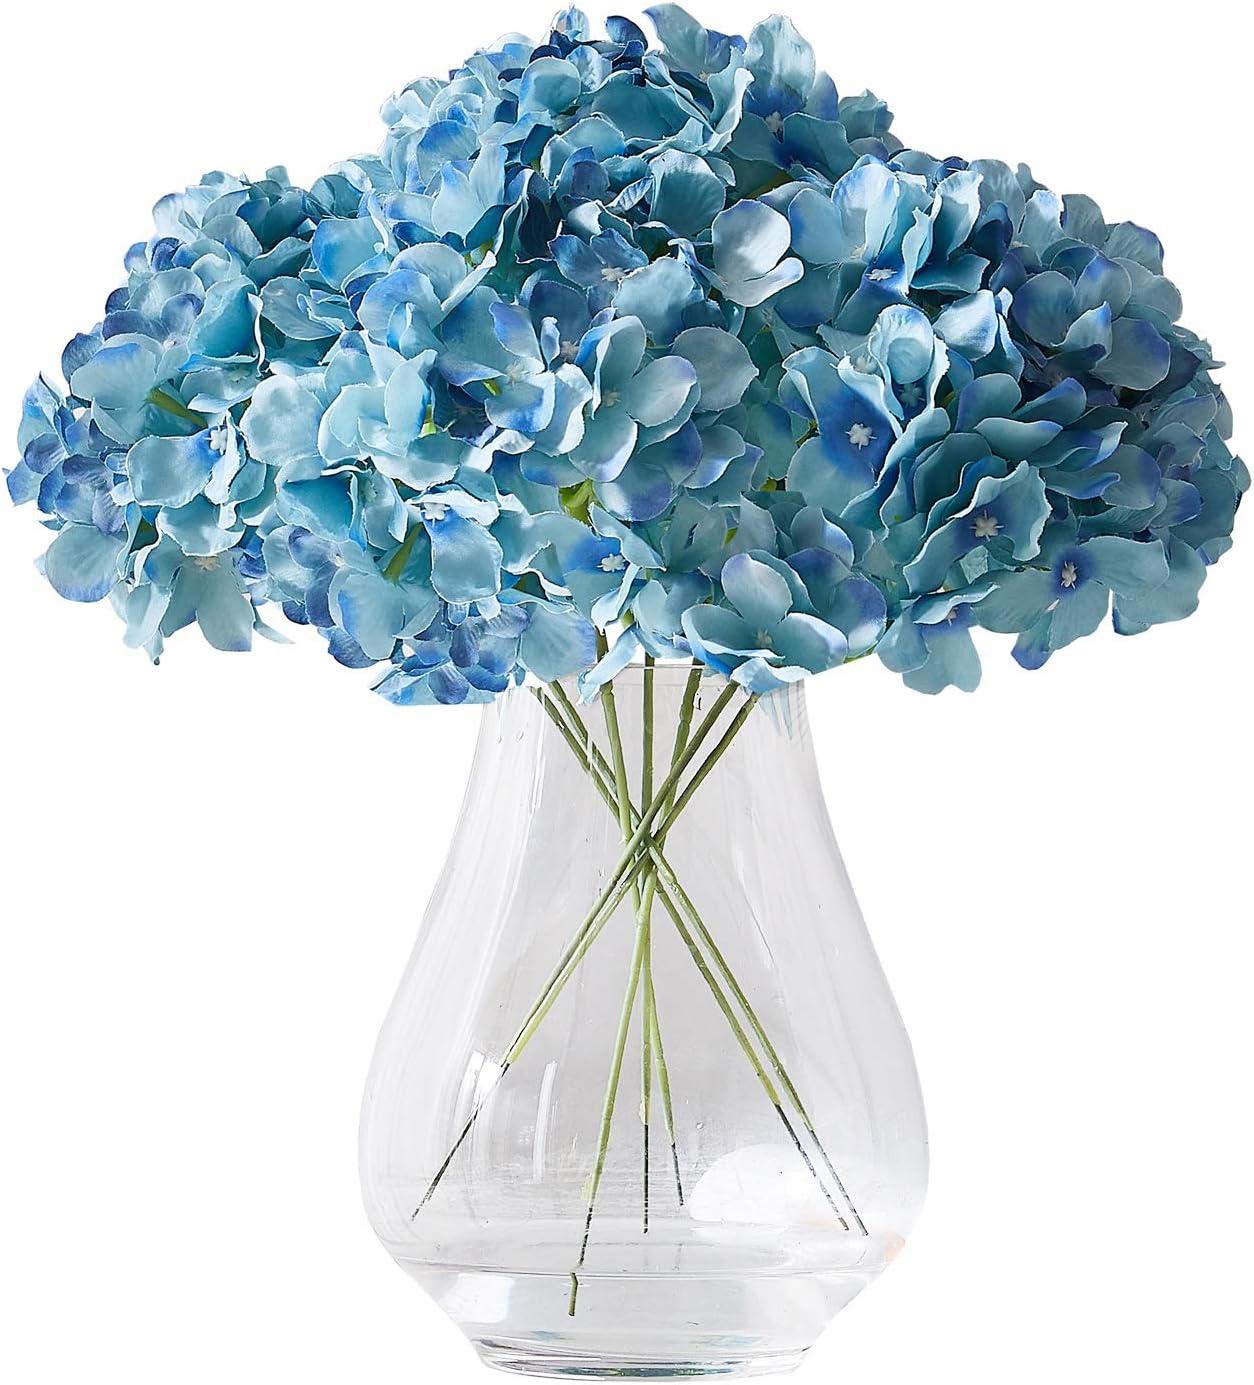 Kislohum Orange Hydrangea Silk Flower 10 Heads Artificial Hydrangea Silk Flowers for Wedding Centerpieces Bouquets DIY Floral Decor Home Decoration with Long Stems